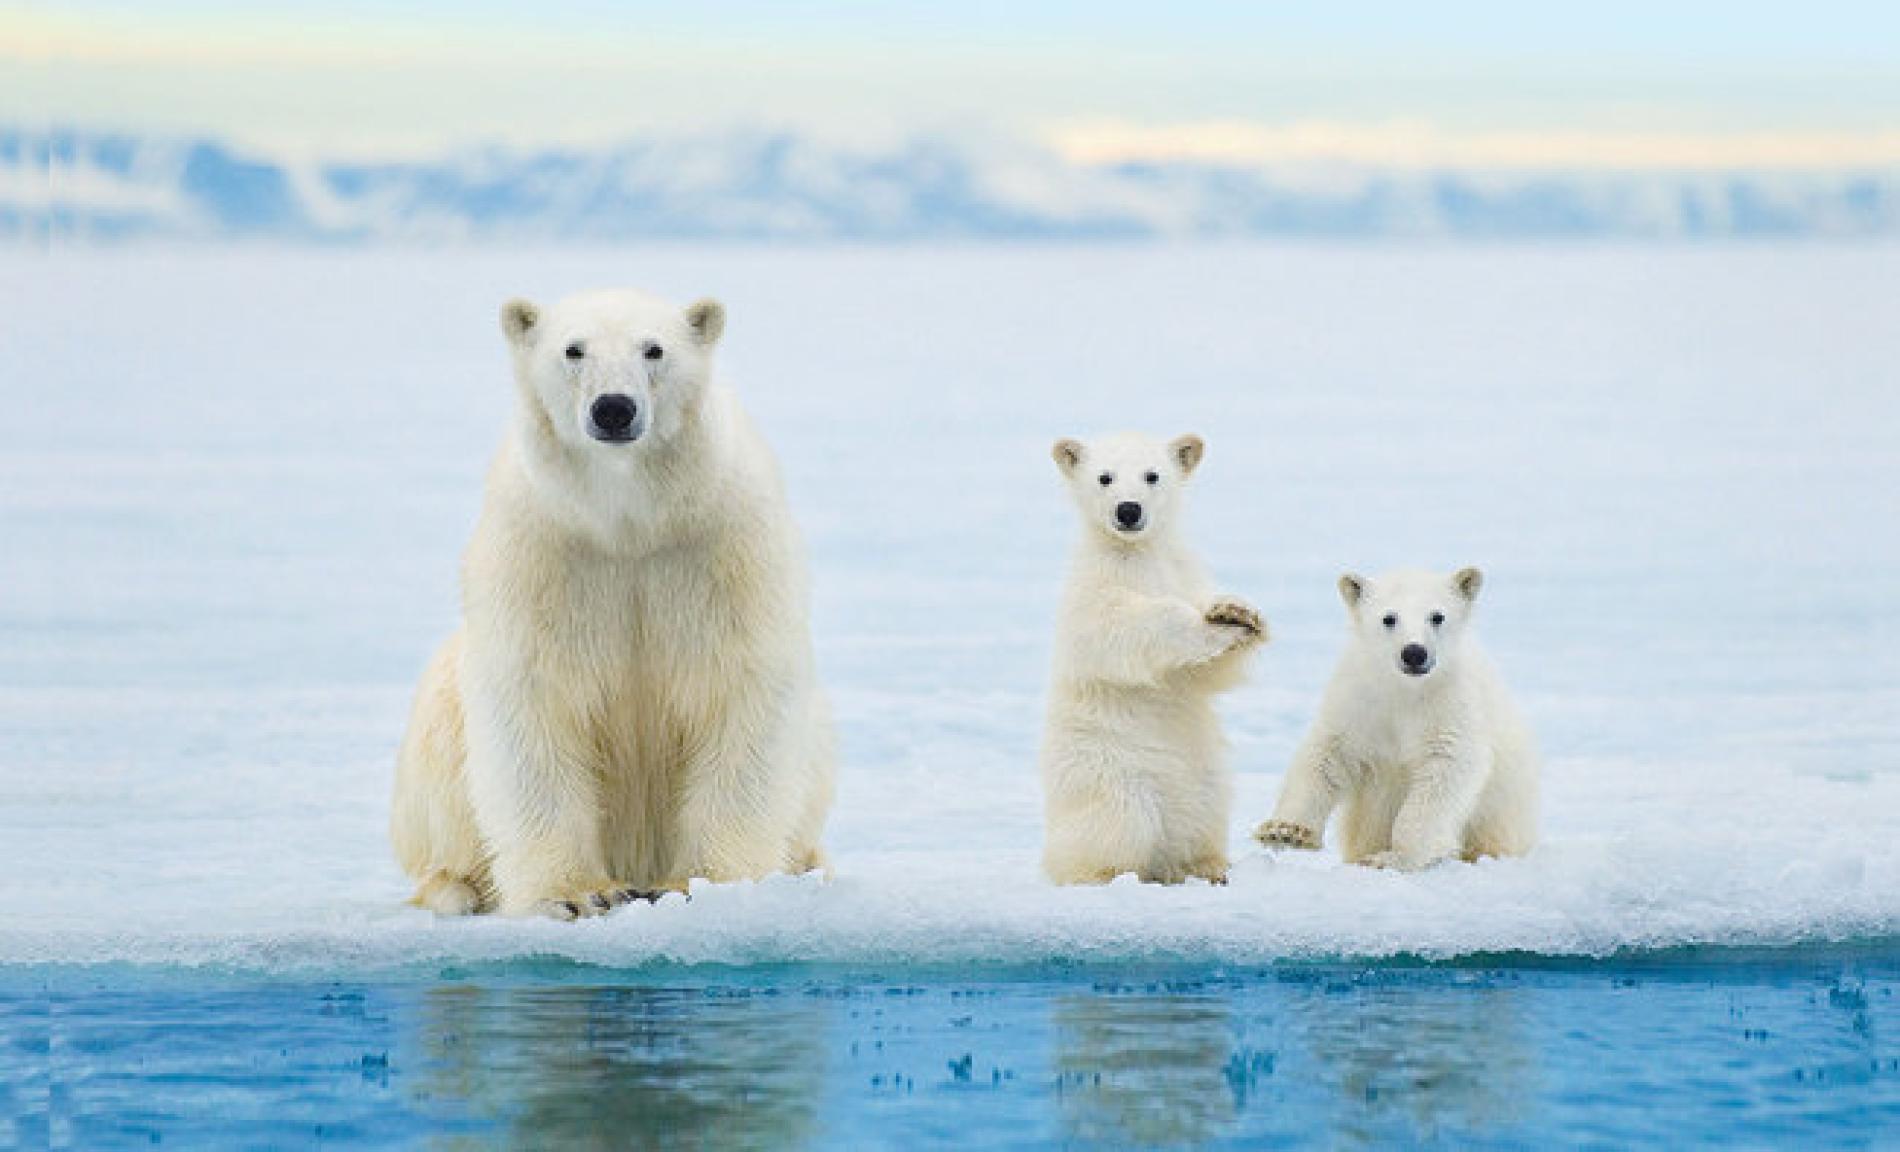 Polar Bear 42 D 25 Polar Bear Crui...